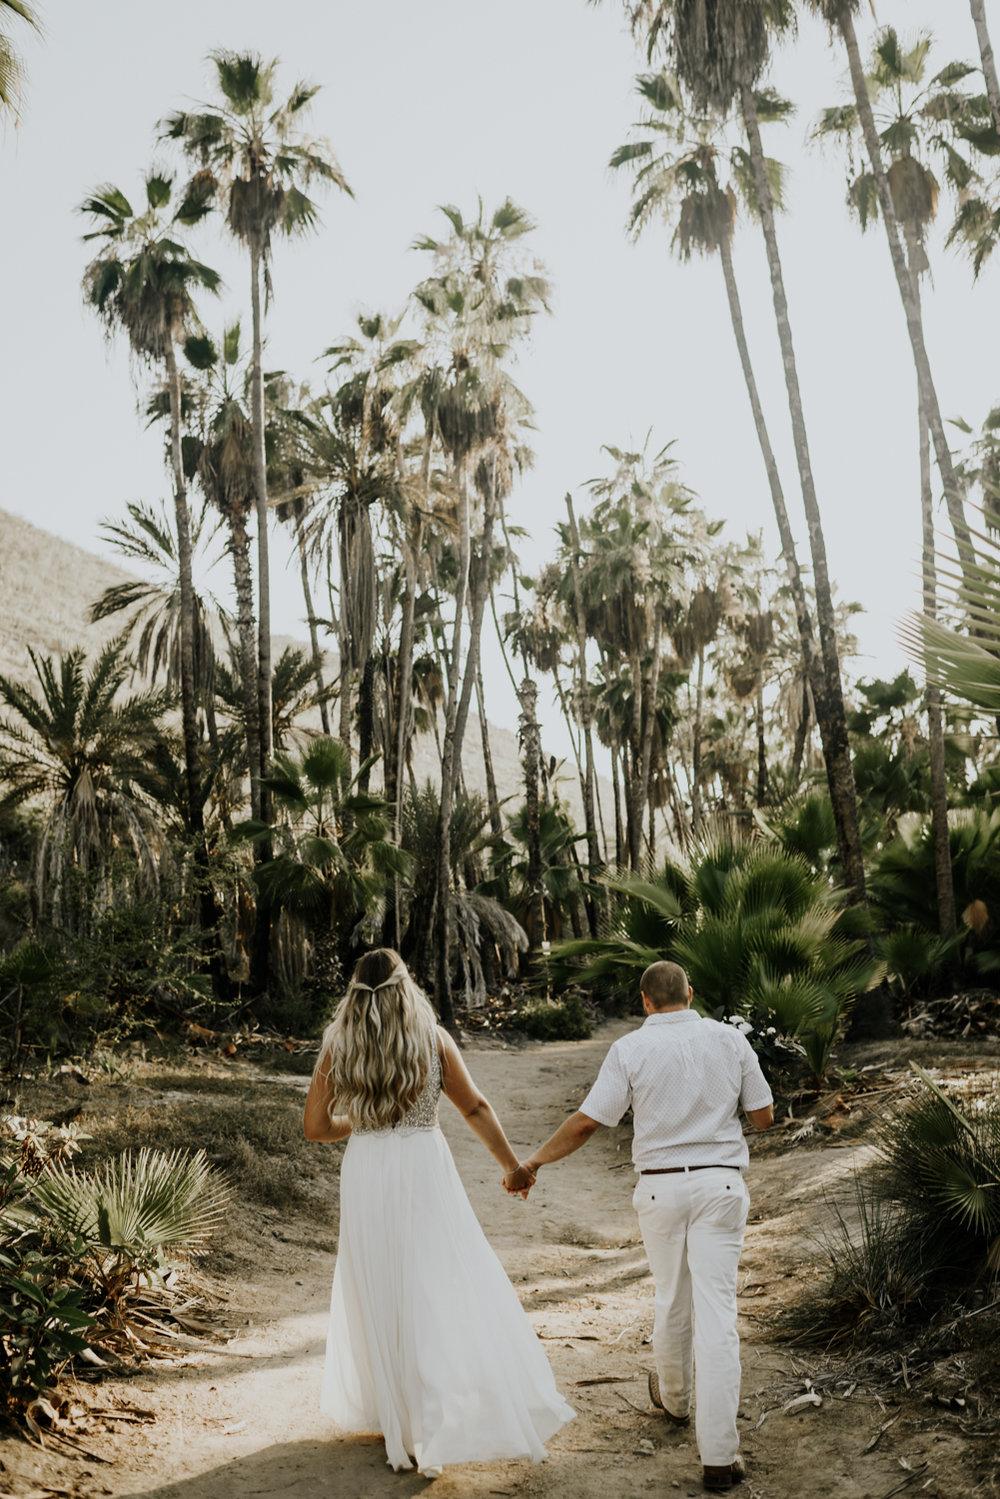 Elopement Photography in Todos Santos, Baja California Sur, Mexico